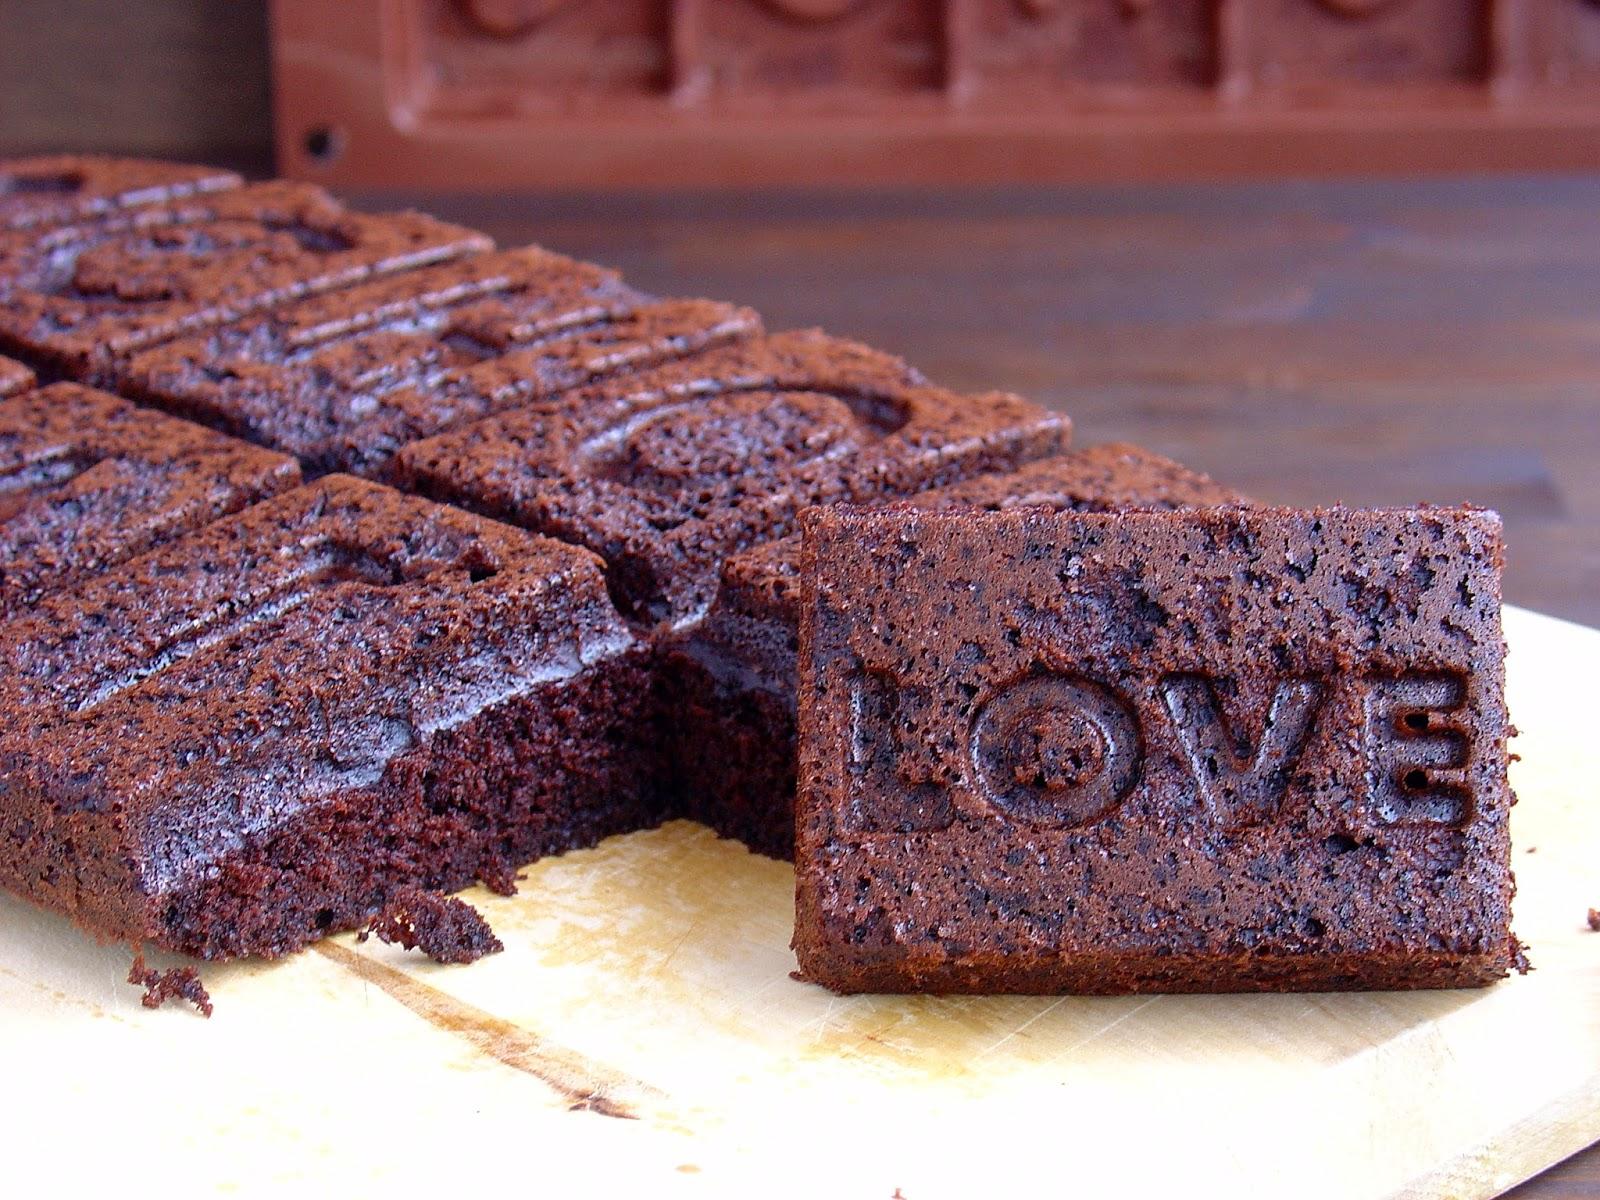 Ma Petite Boulangerie: Chocolate Olive Oil Cake